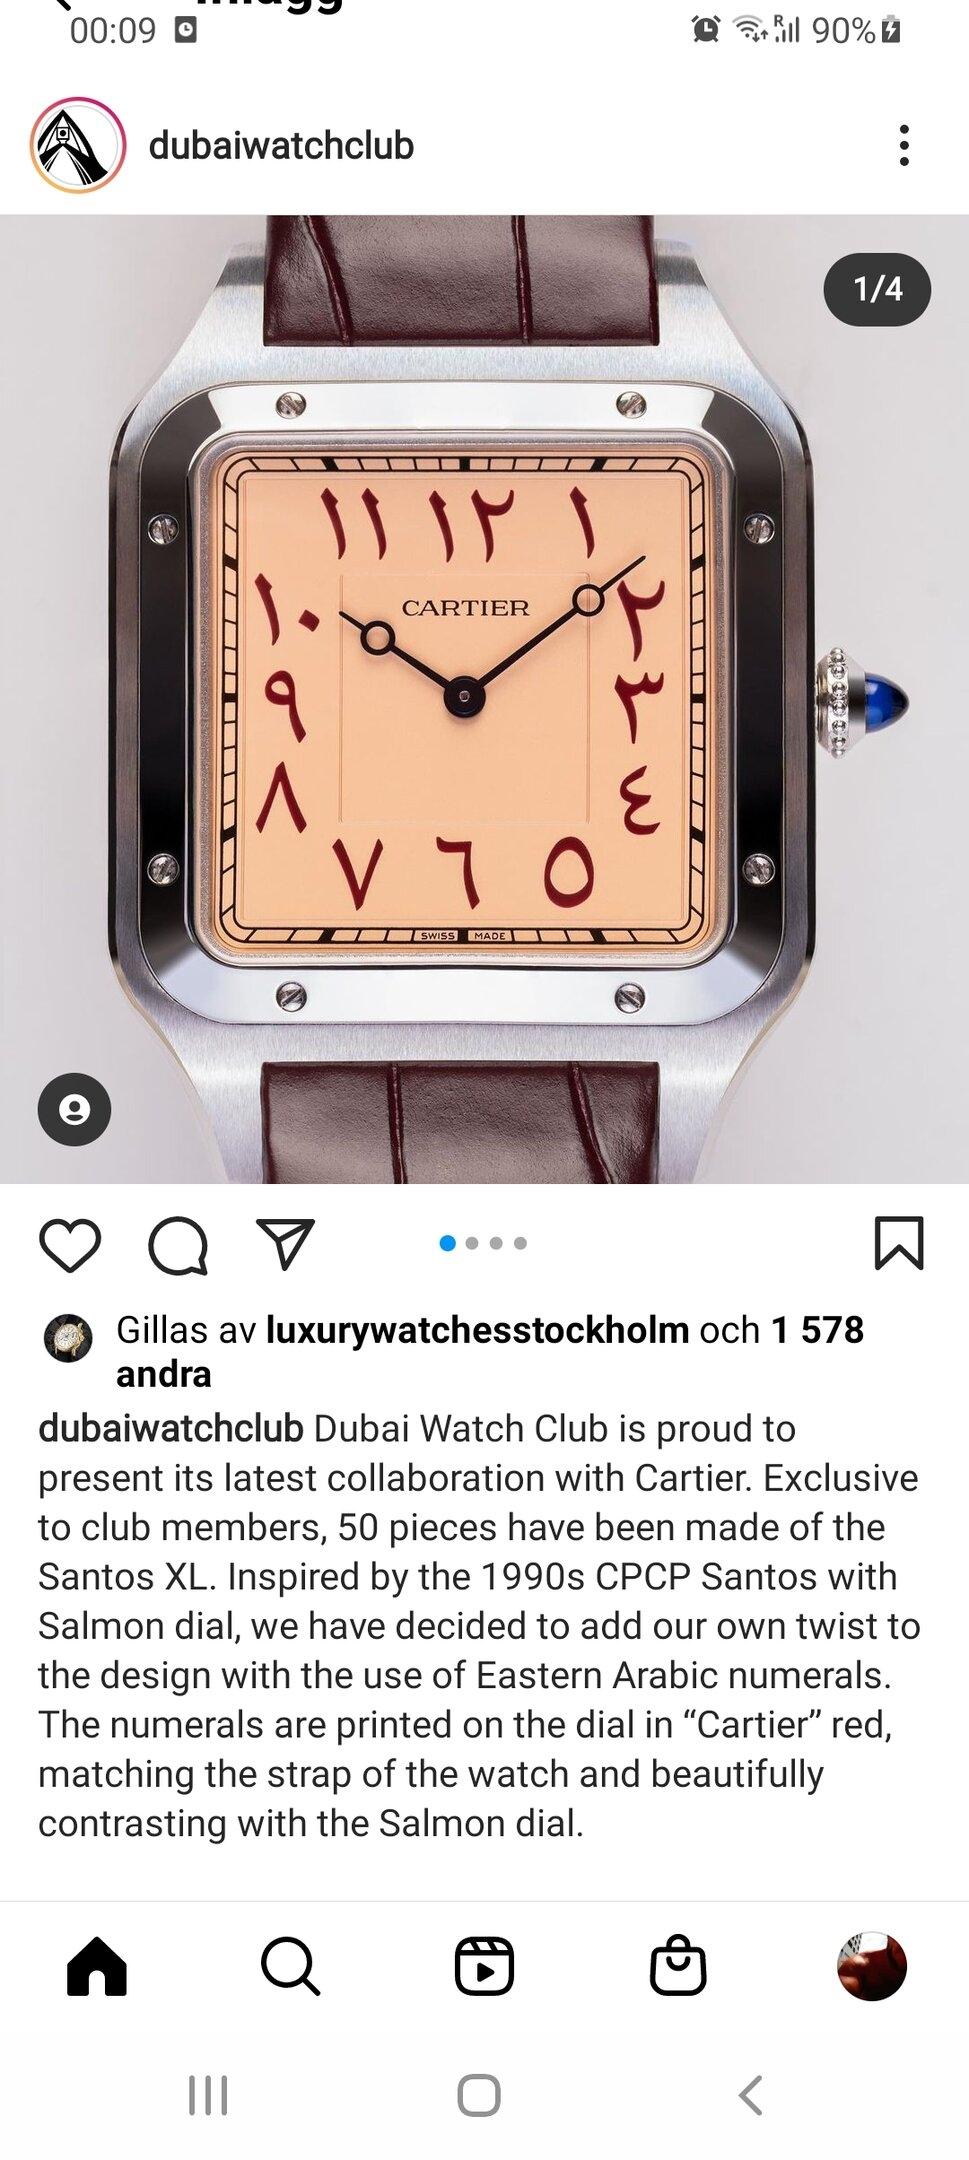 Screenshot_20211014-000958_Instagram.jpg